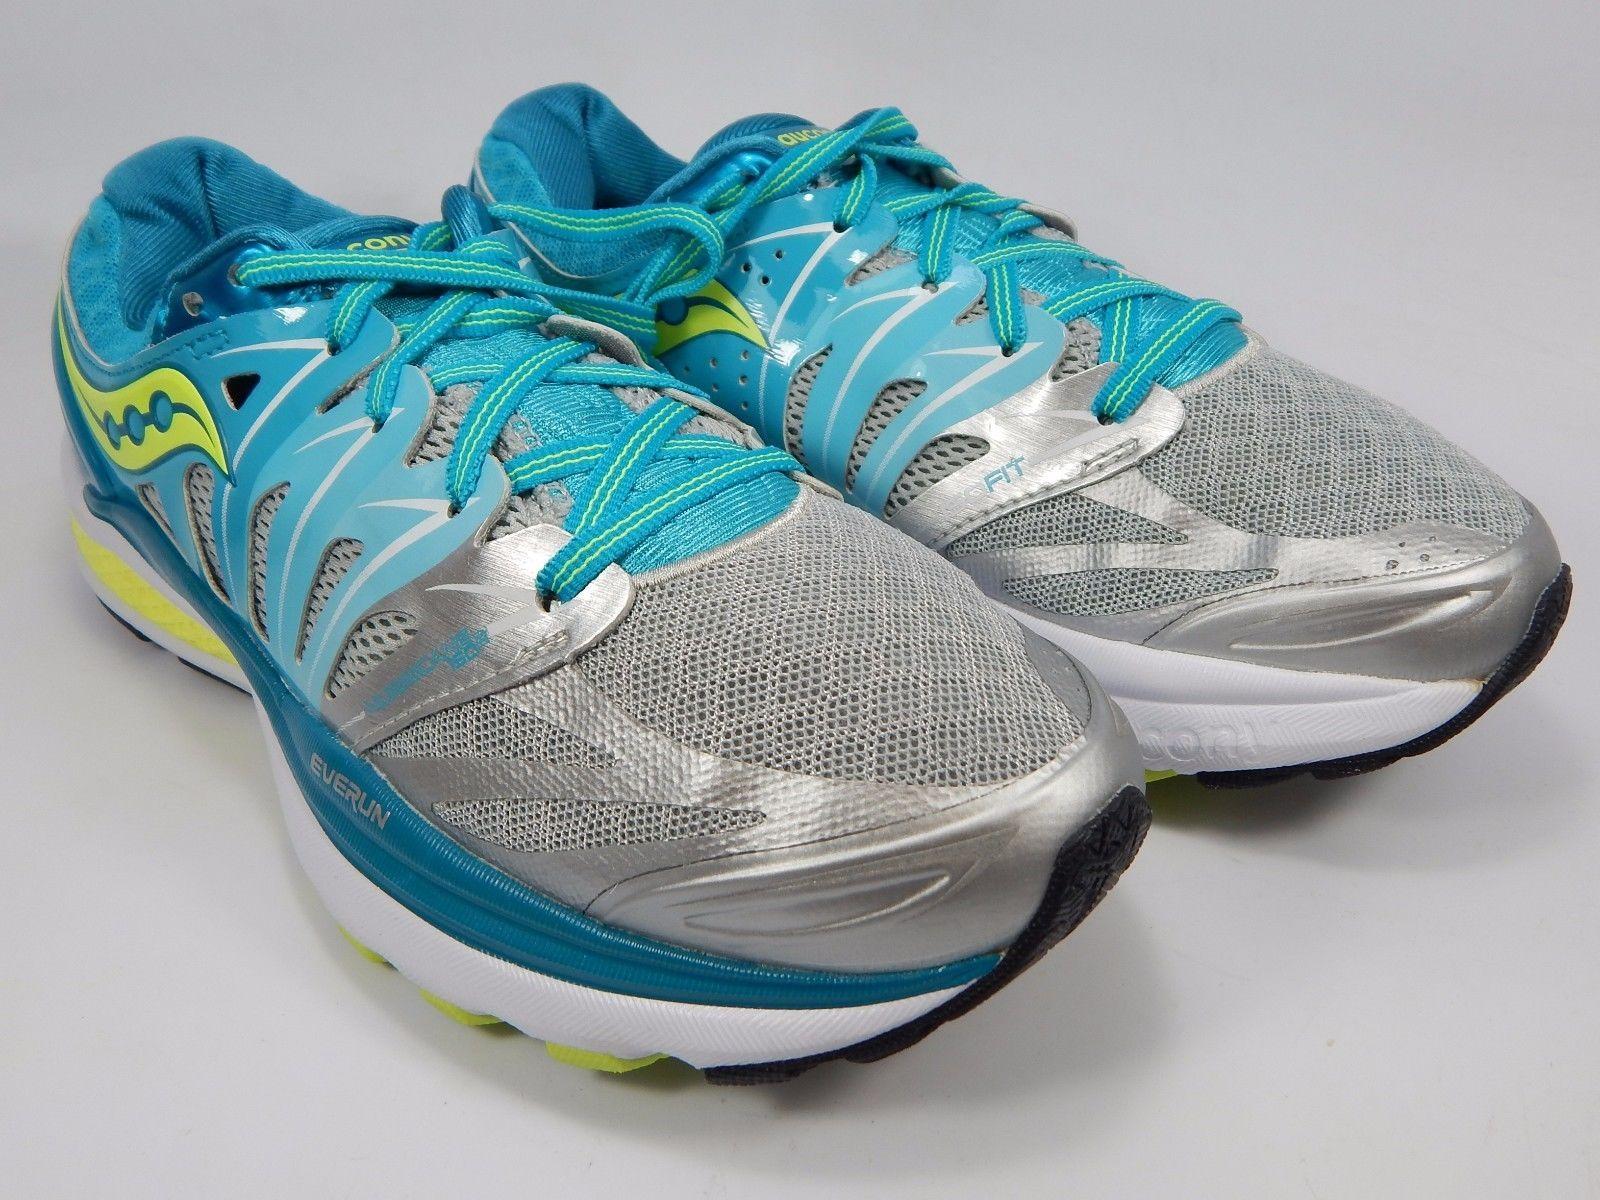 Saucony Hurricane ISO 2 Women's Running Shoes Size US 8 M (B) EU 39 S10293-1